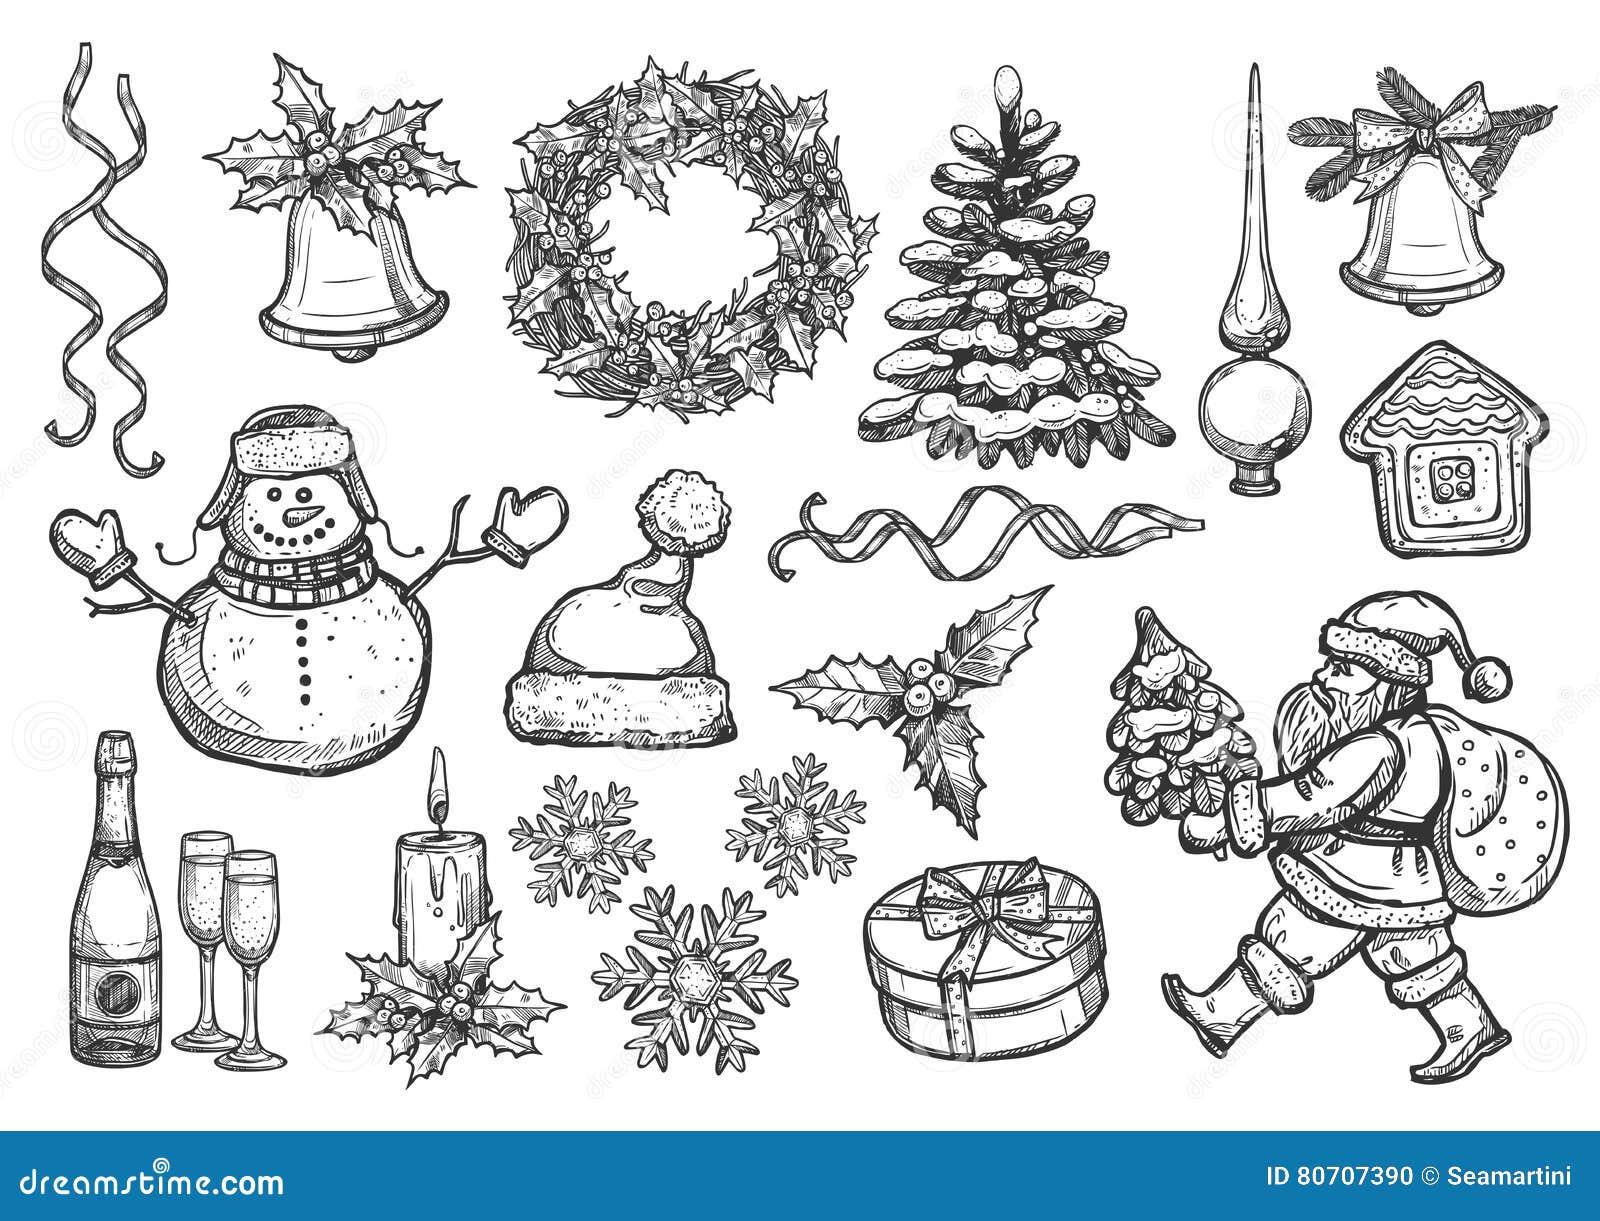 New Year Christmas Holiday Vector Sketch Symbols Stock Vector - Illustration 80707390